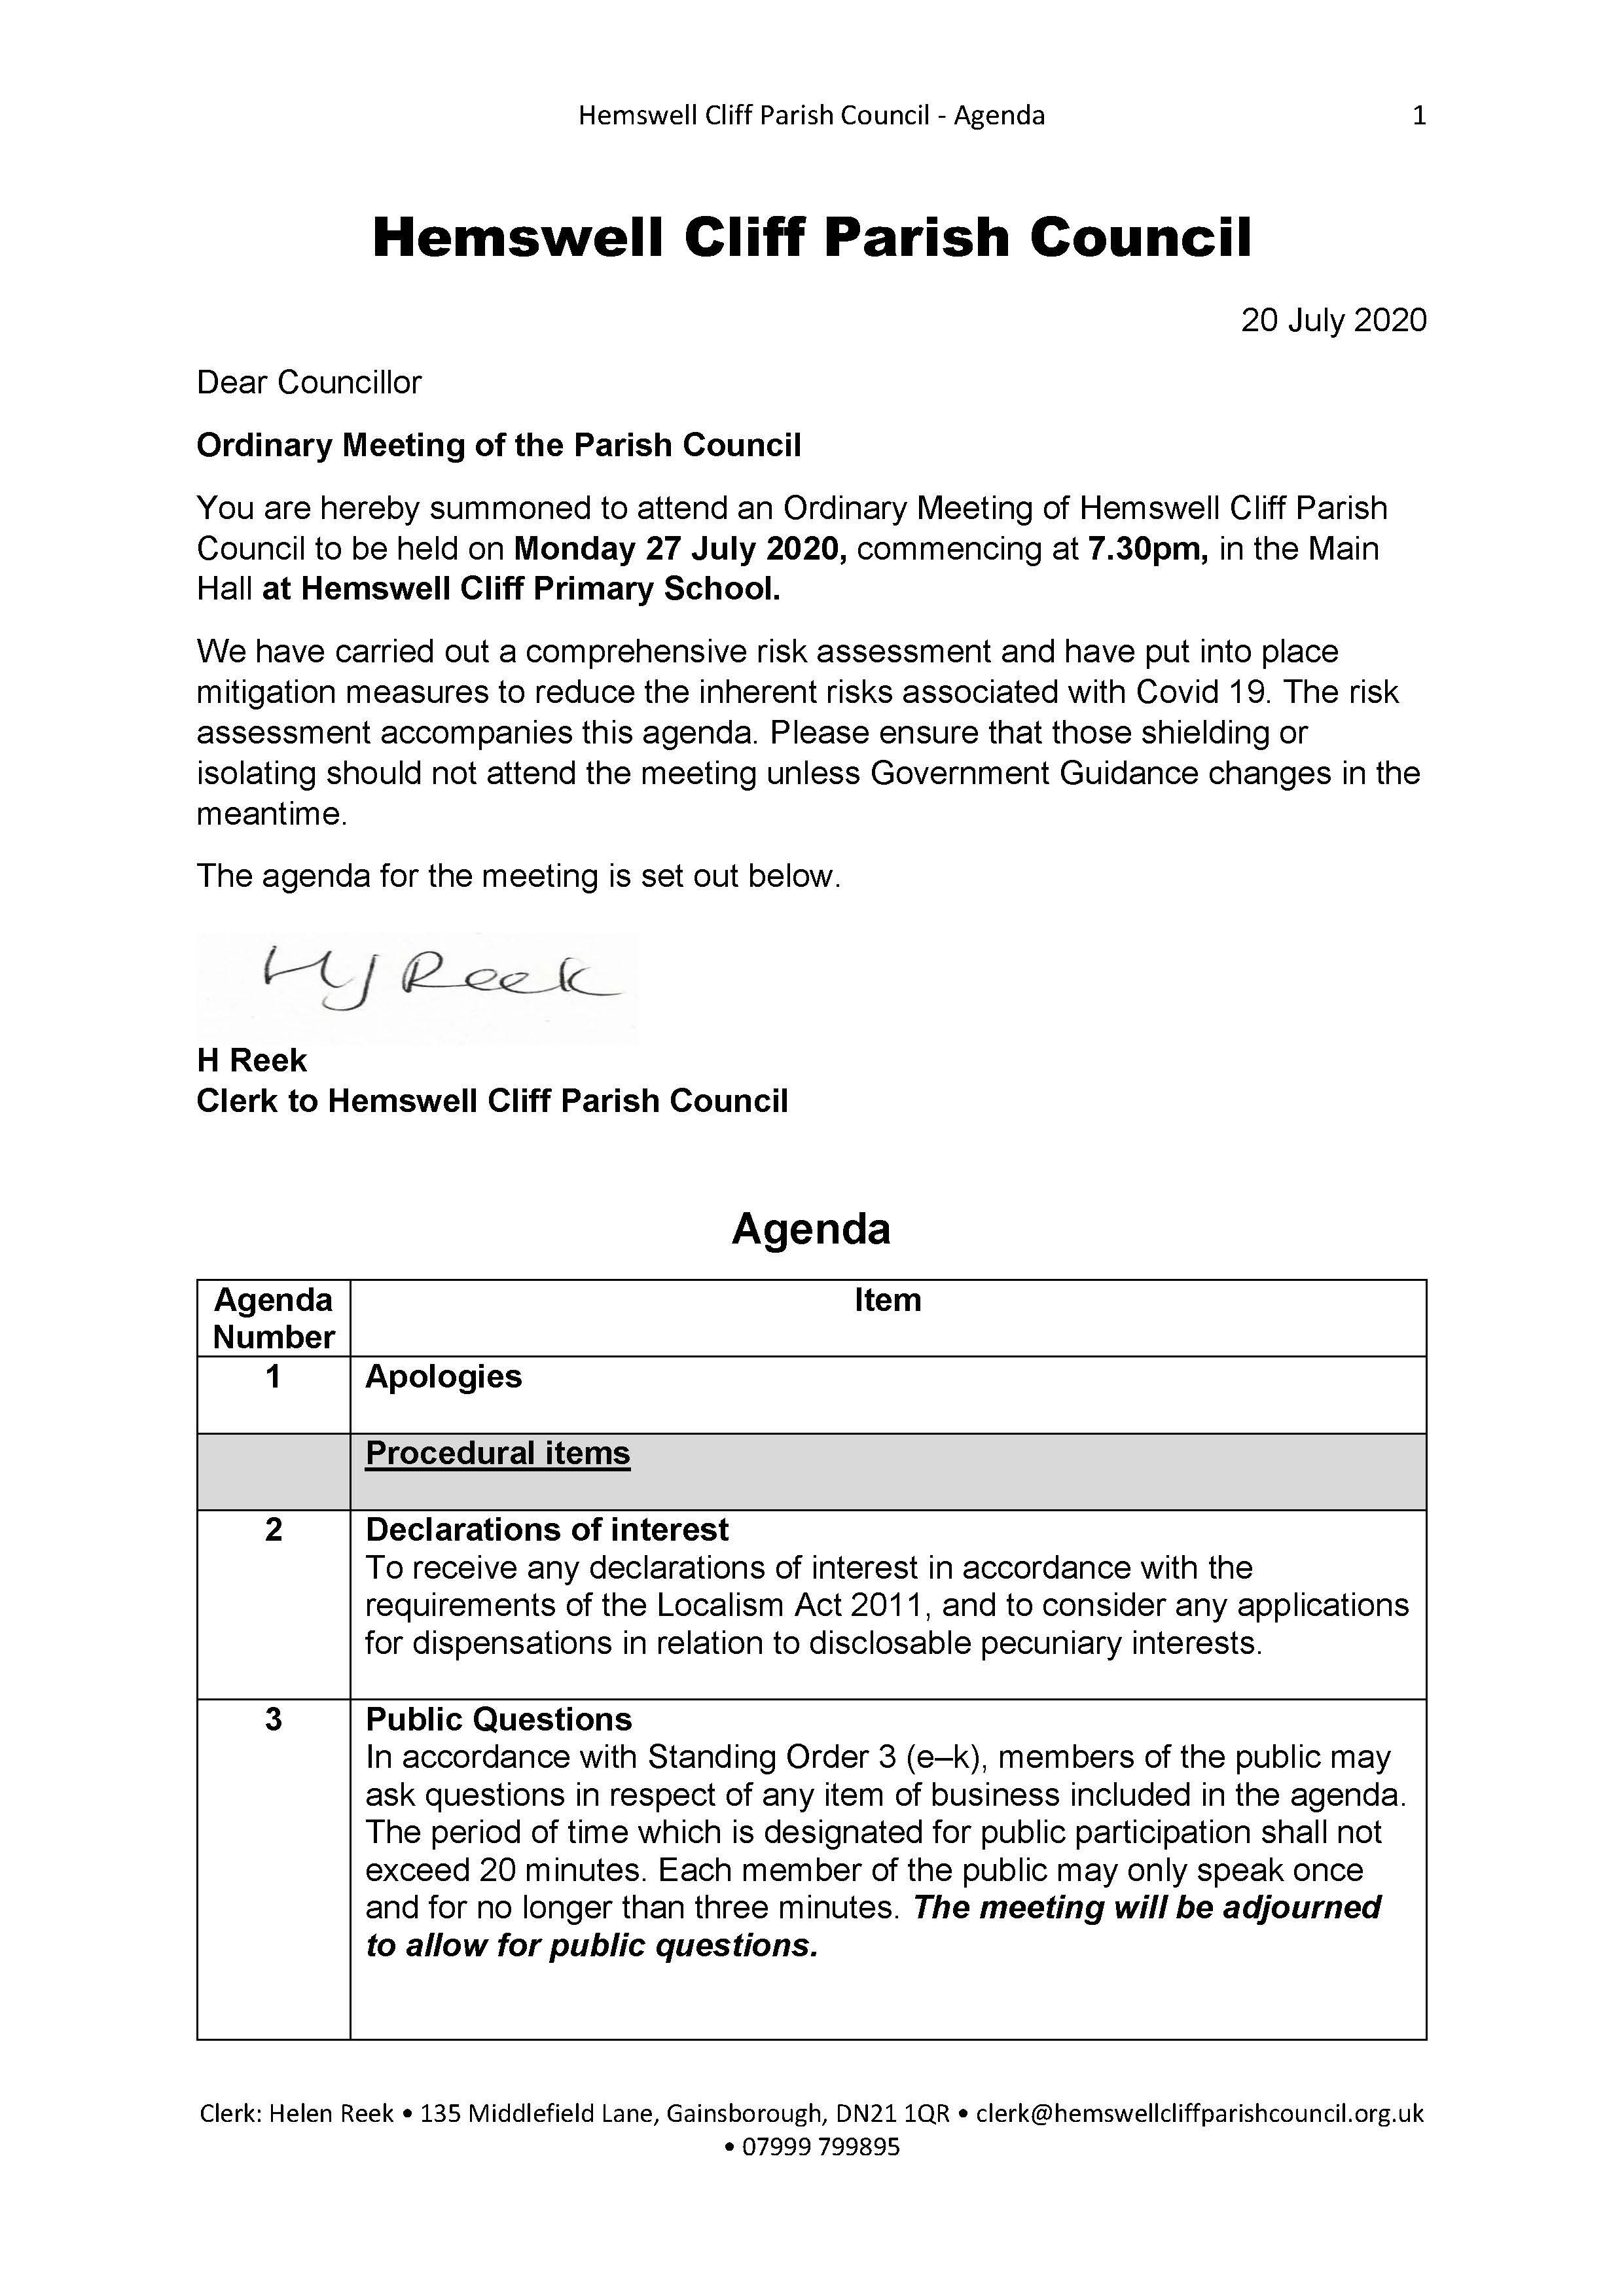 HCPC_Agenda_27.07.20_Page_1.jpg